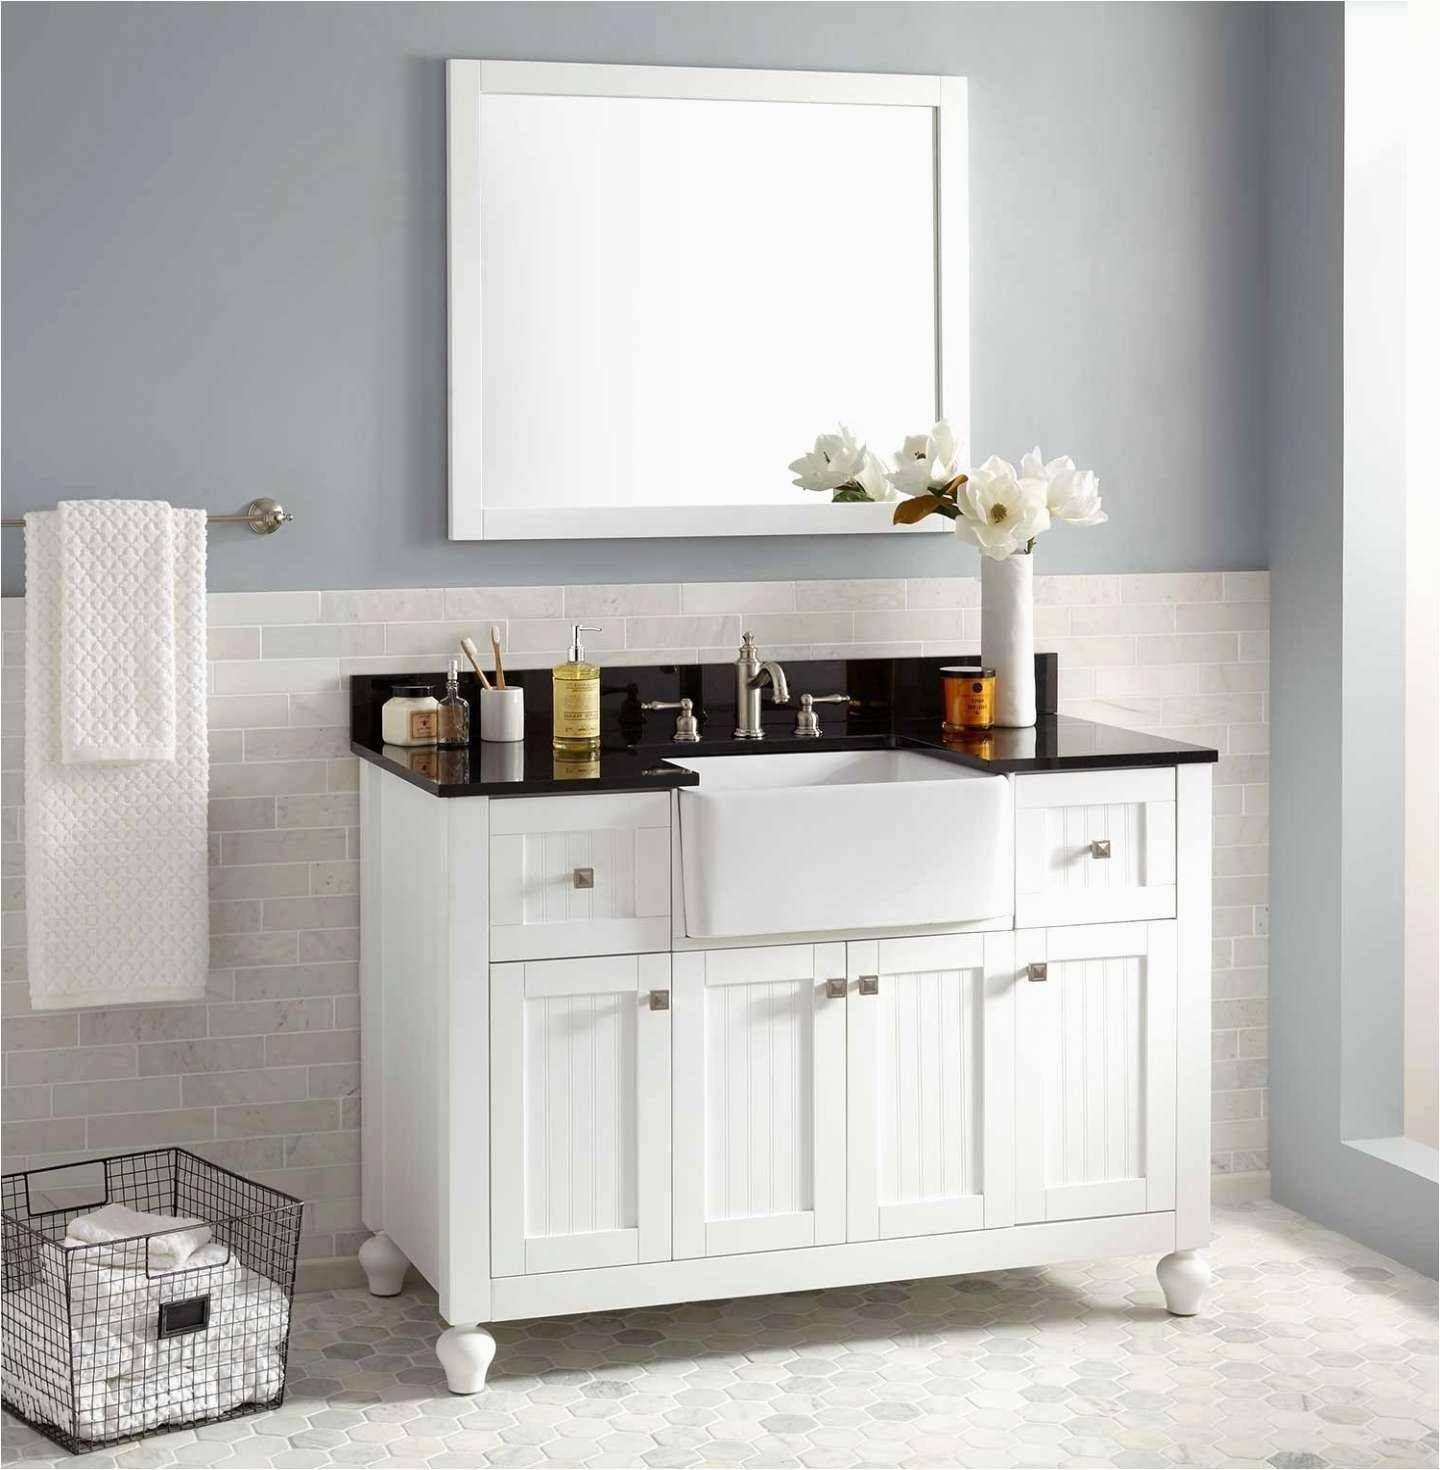 Makeup Cabinet More Image Visite Grey Bathroom Vanity Bathroom Furniture Design Light Fixtures Bathroom Vanity